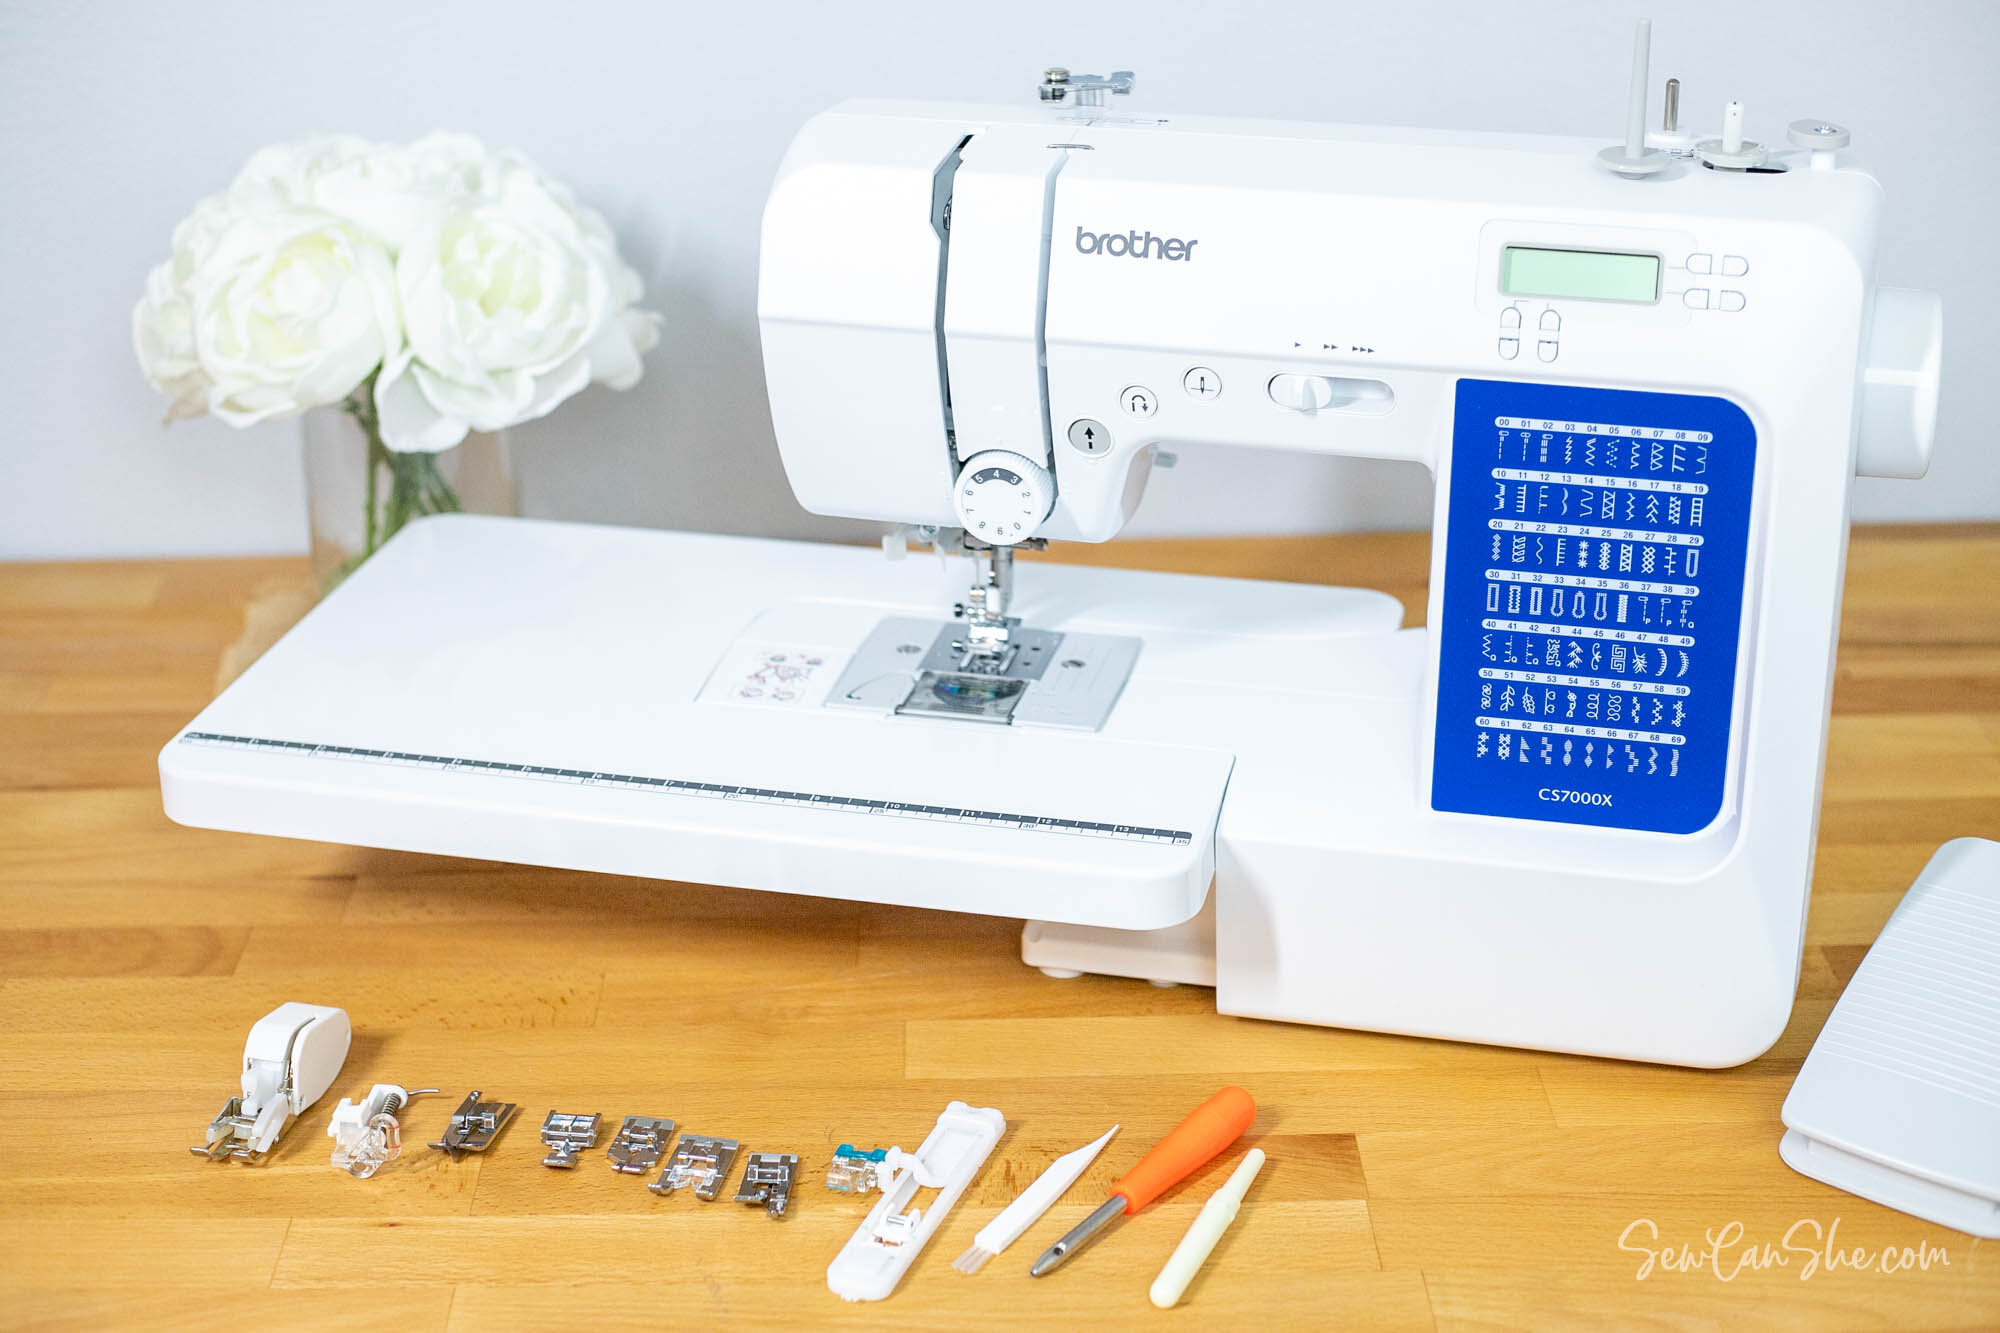 Brother CS7000X sewing machine